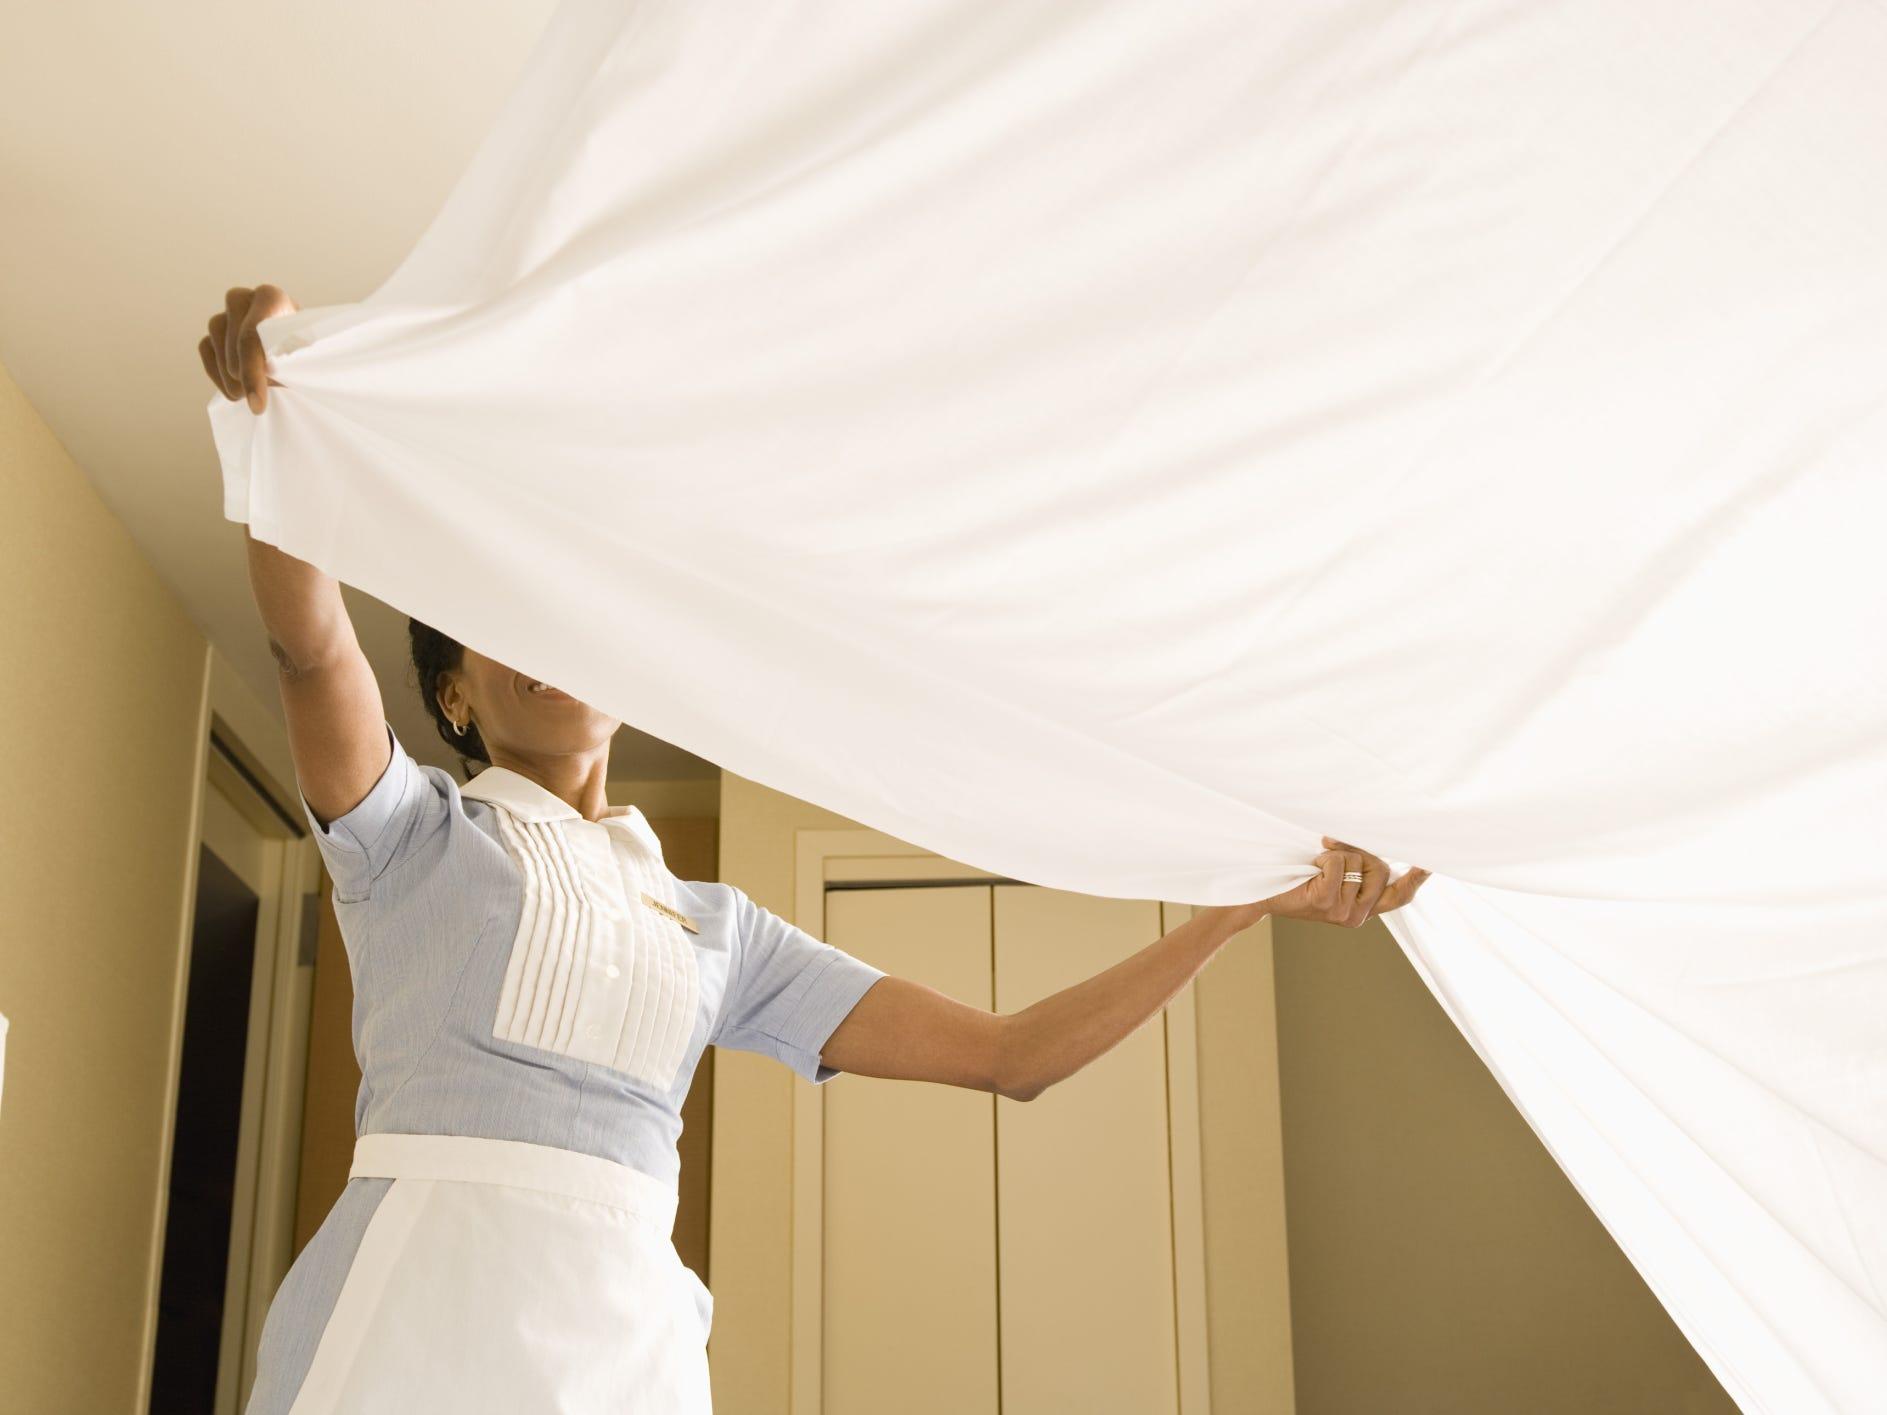 Hilton Worldwide, hiring 230. The hotel and resort operator is adding jobs from housekeeper to engineer. More info: jobs.hiltonworldwide.com.